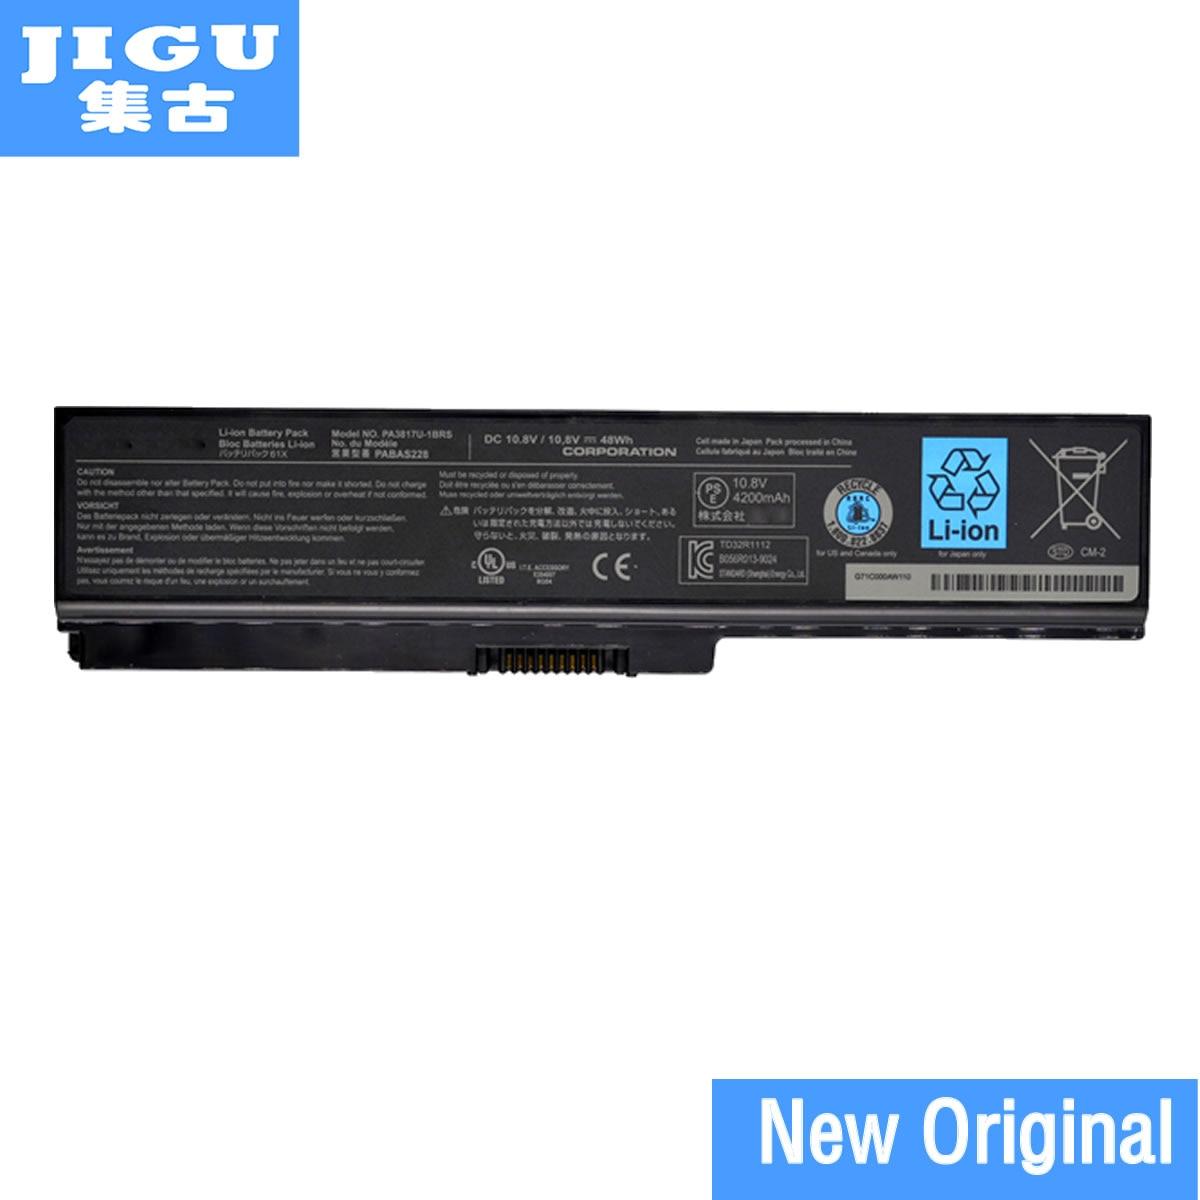 JIGU Original Battery For Toshiba PA3817U-1BRS PA3817 PA3818U-1BRS PA3817U For Satellite L745 L740 L655 L750 L750D L755 L630